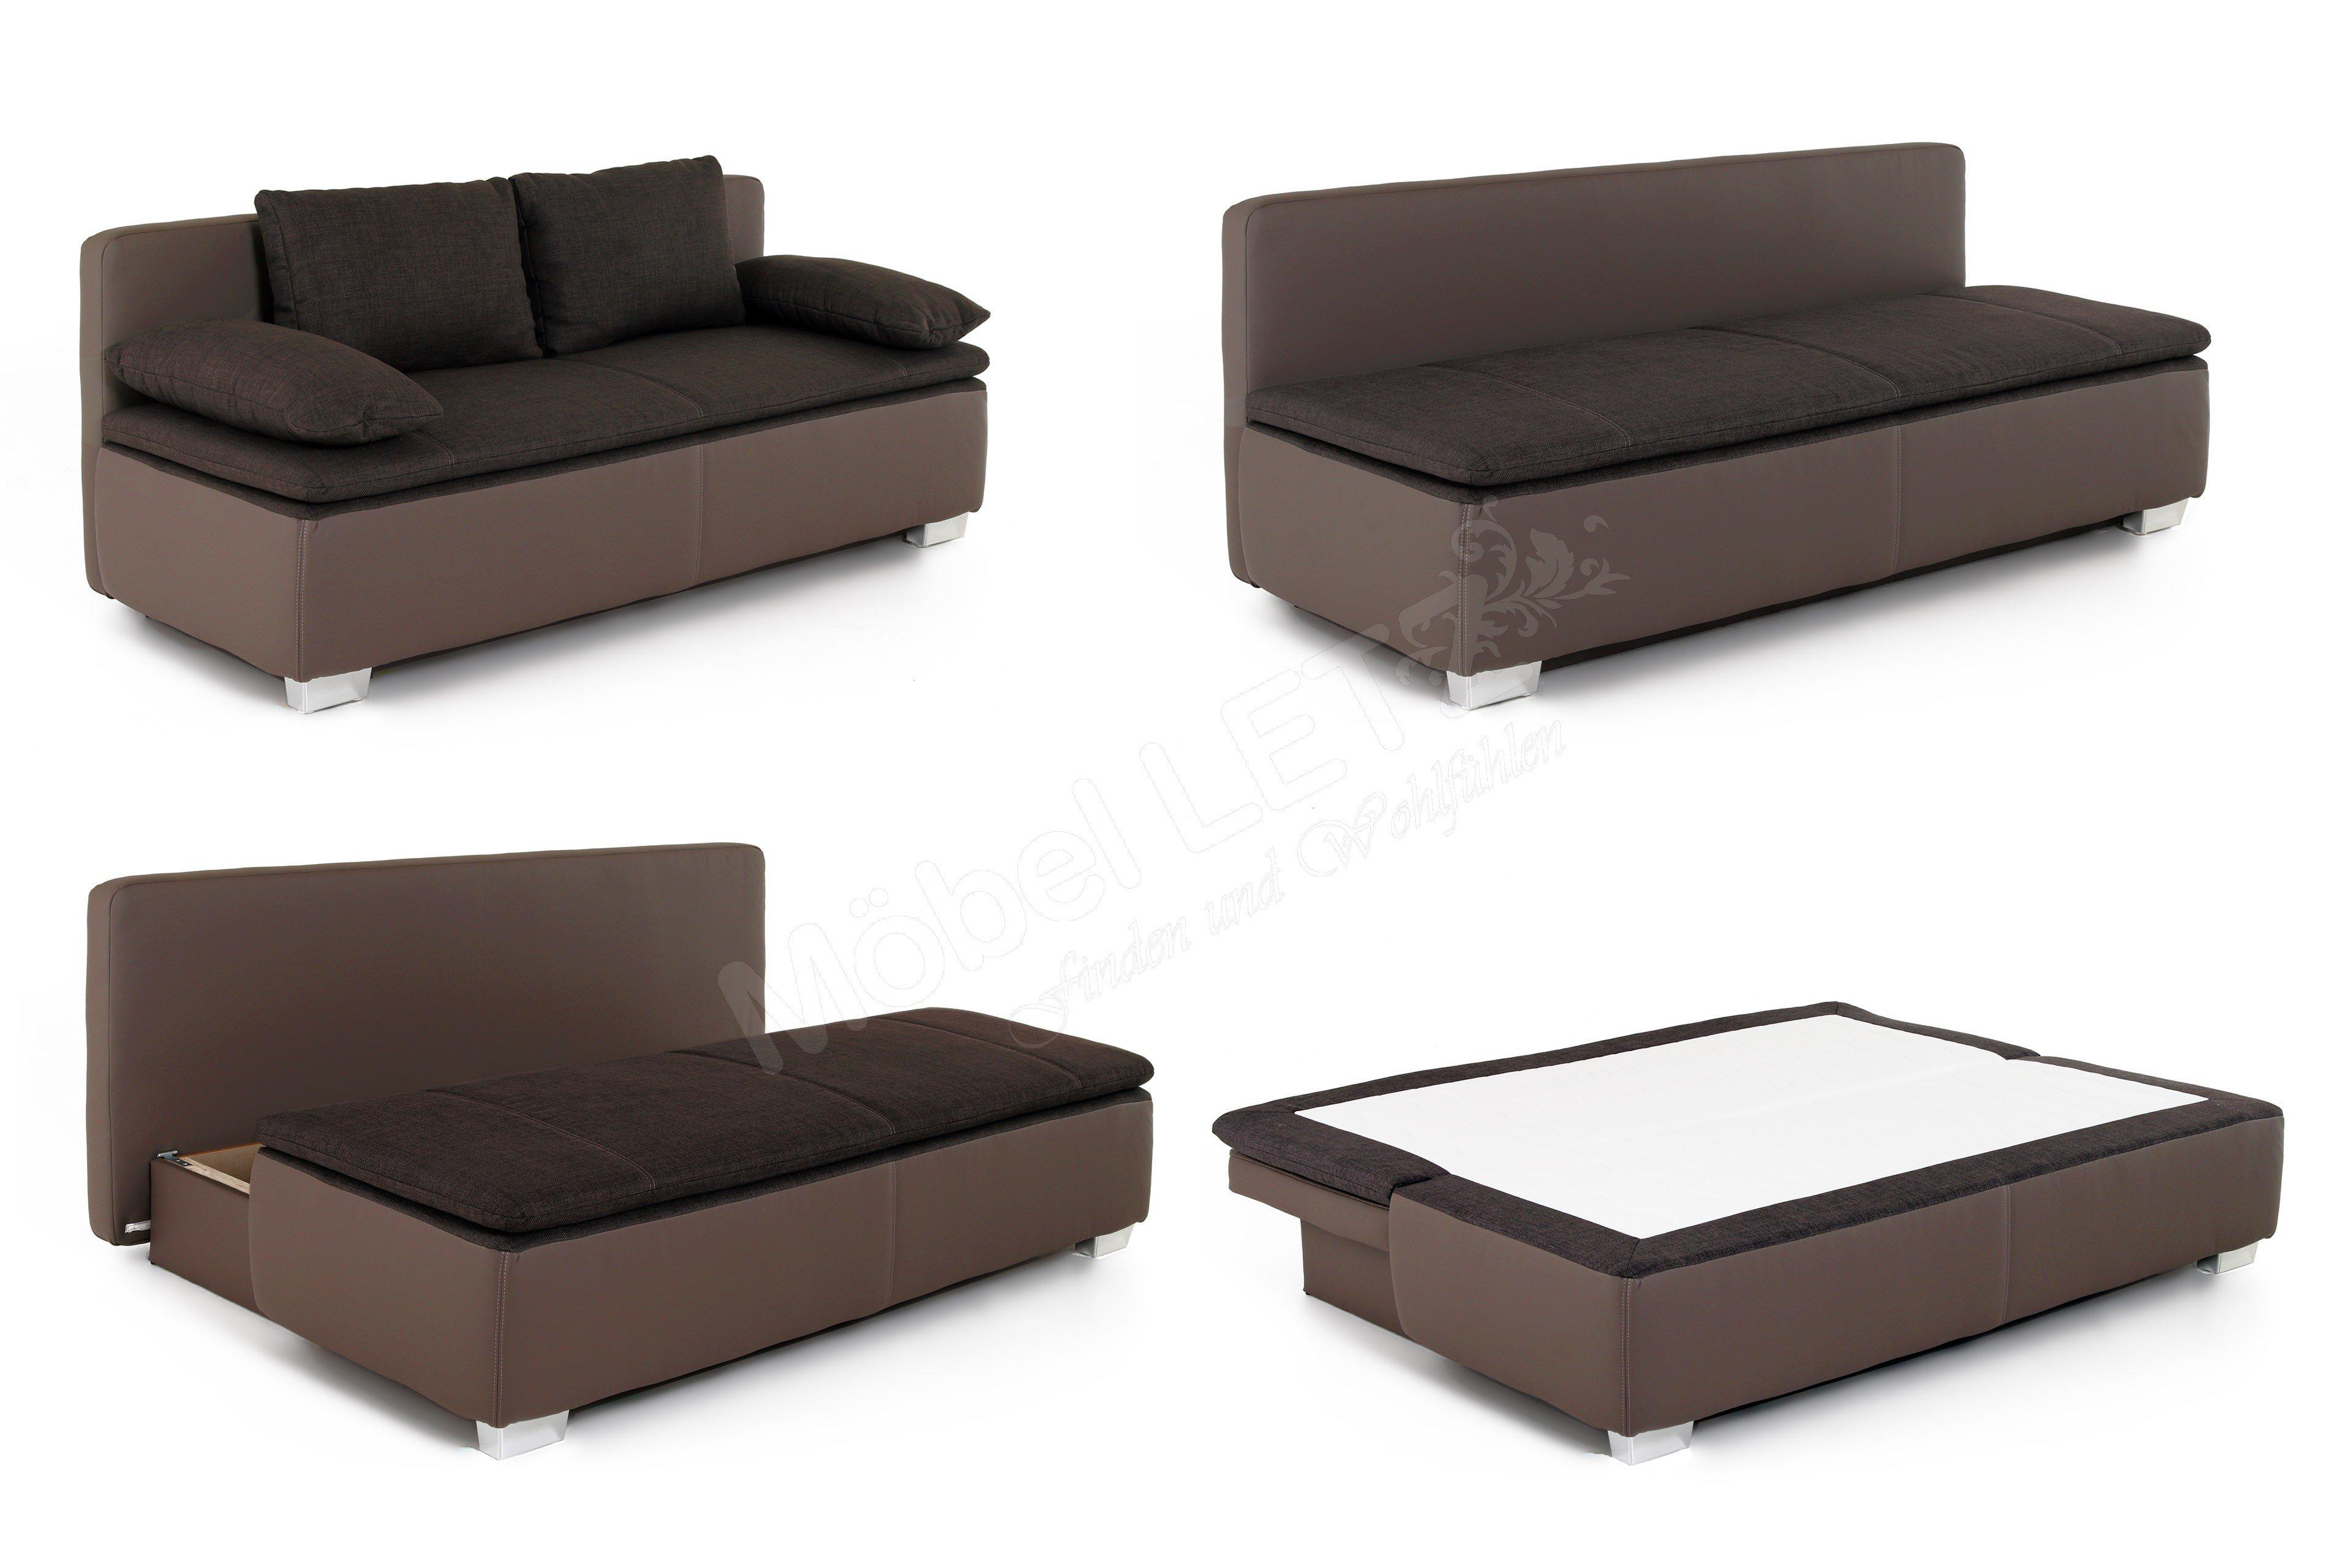 jockenh fer schlafsofa duett in braun m bel letz ihr online shop. Black Bedroom Furniture Sets. Home Design Ideas